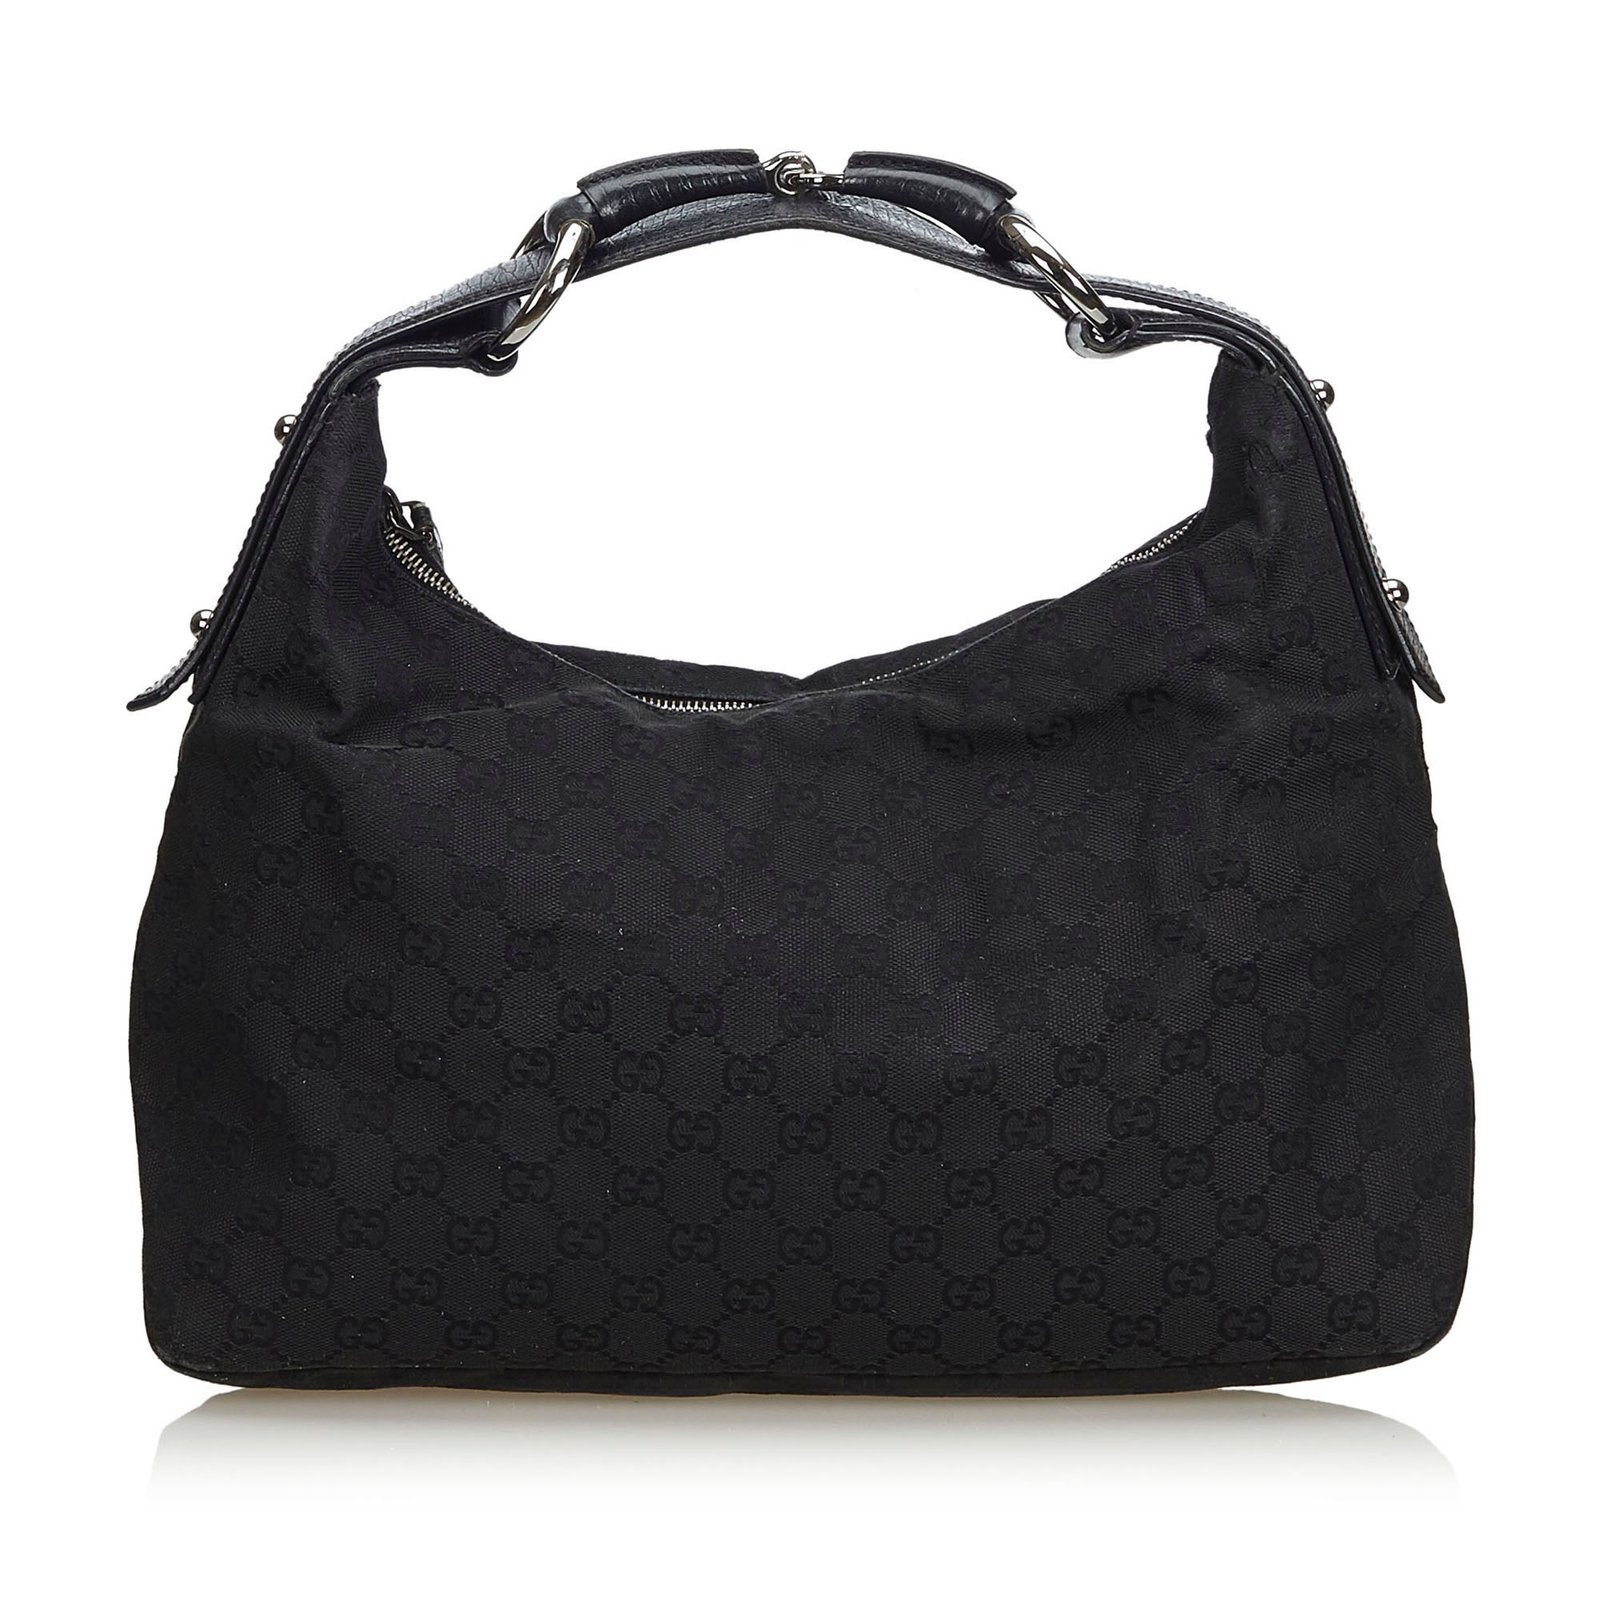 771300473 Gucci GG Jacquard Horsebit Hobo Bag Handbags Leather,Other,Cloth Black  ref.107225